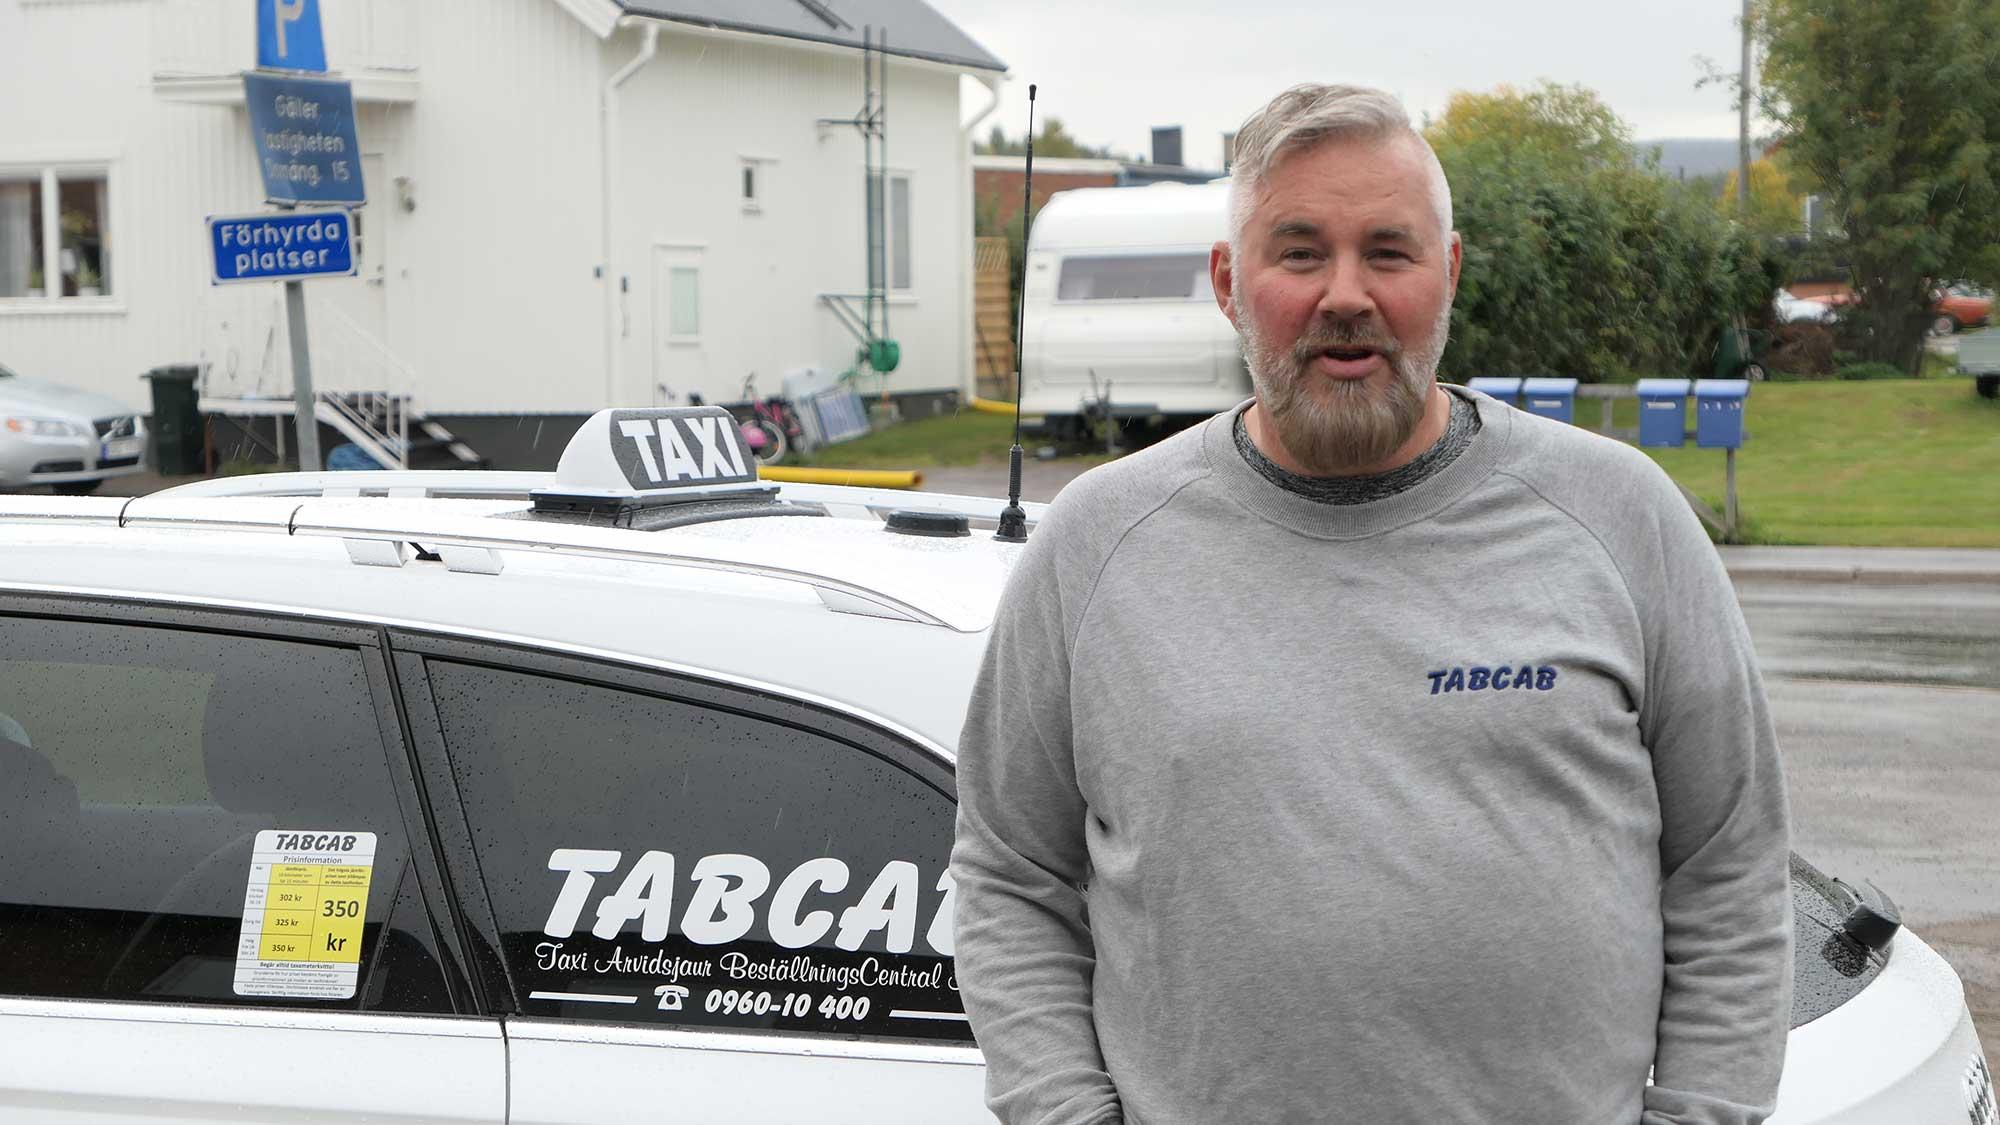 Christer Mattsson, TABCAB AB, Arvidsjaur Sweden